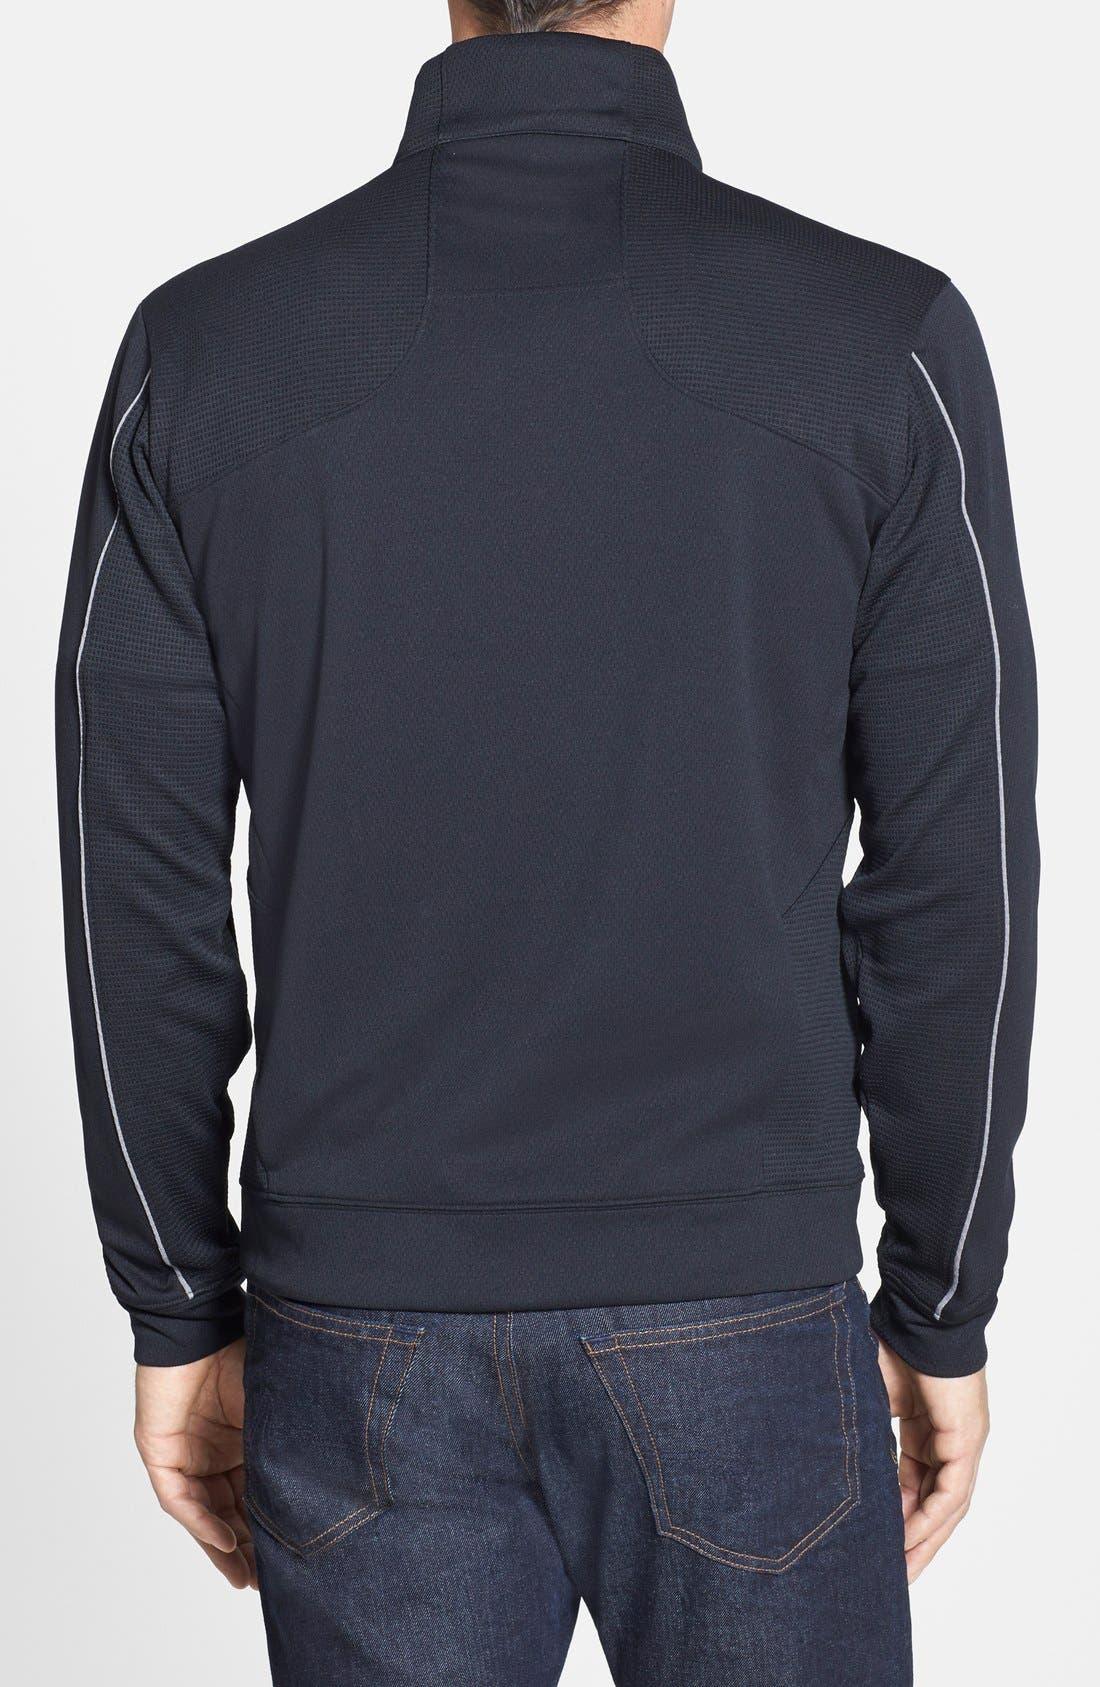 San Francisco 49ers - Edge DryTec Moisture Wicking Half Zip Pullover,                             Alternate thumbnail 2, color,                             001